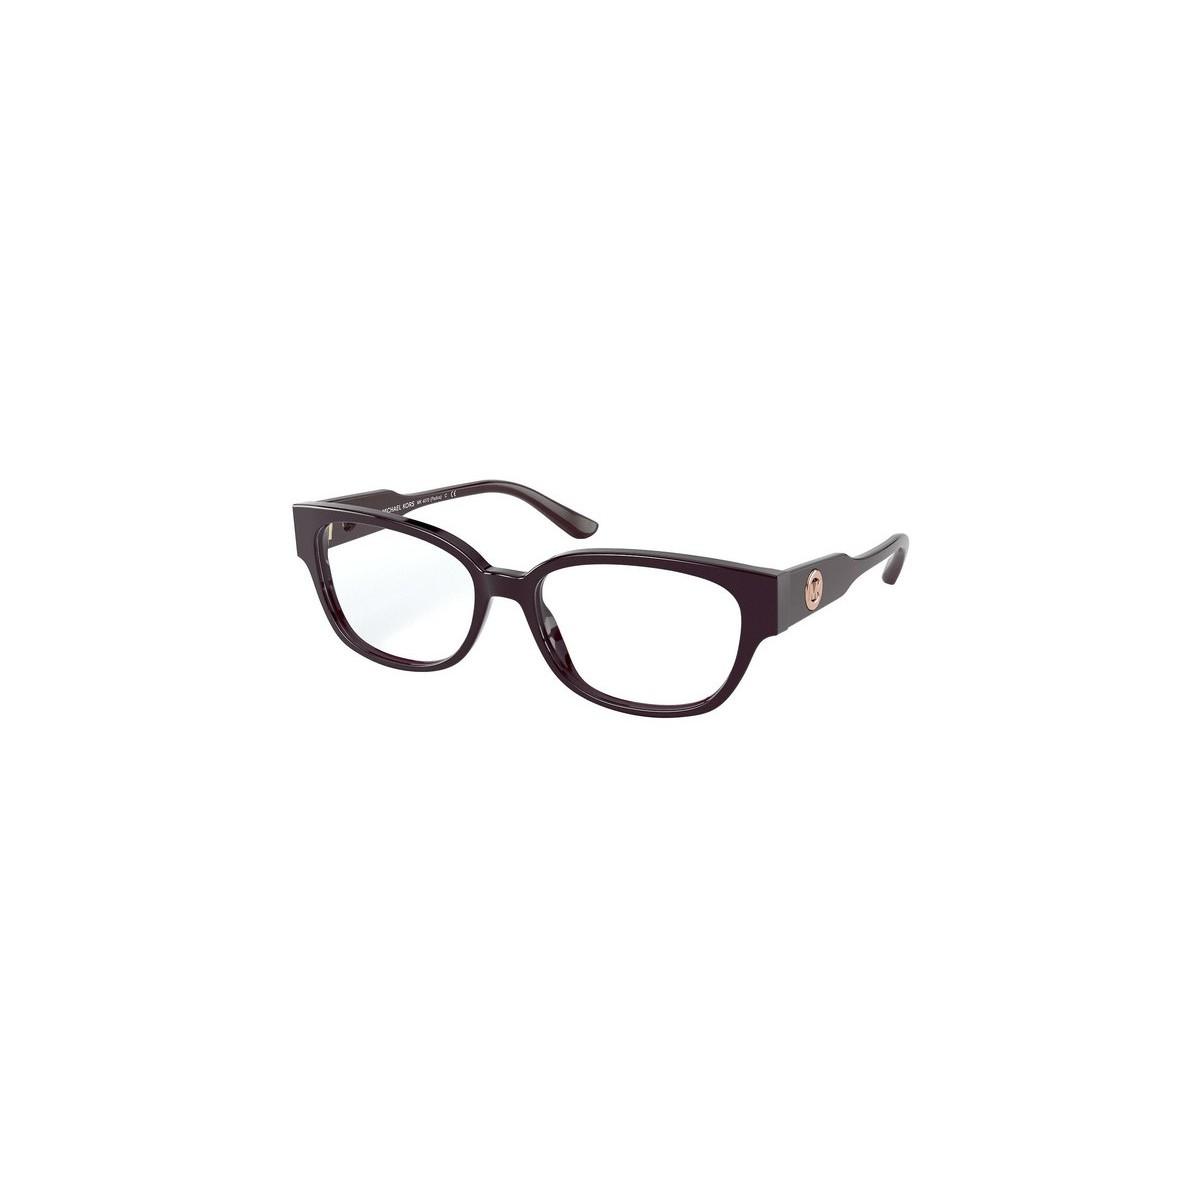 Óculos de Grau Michael Kors Padua Marrom  MK4072 3344 52